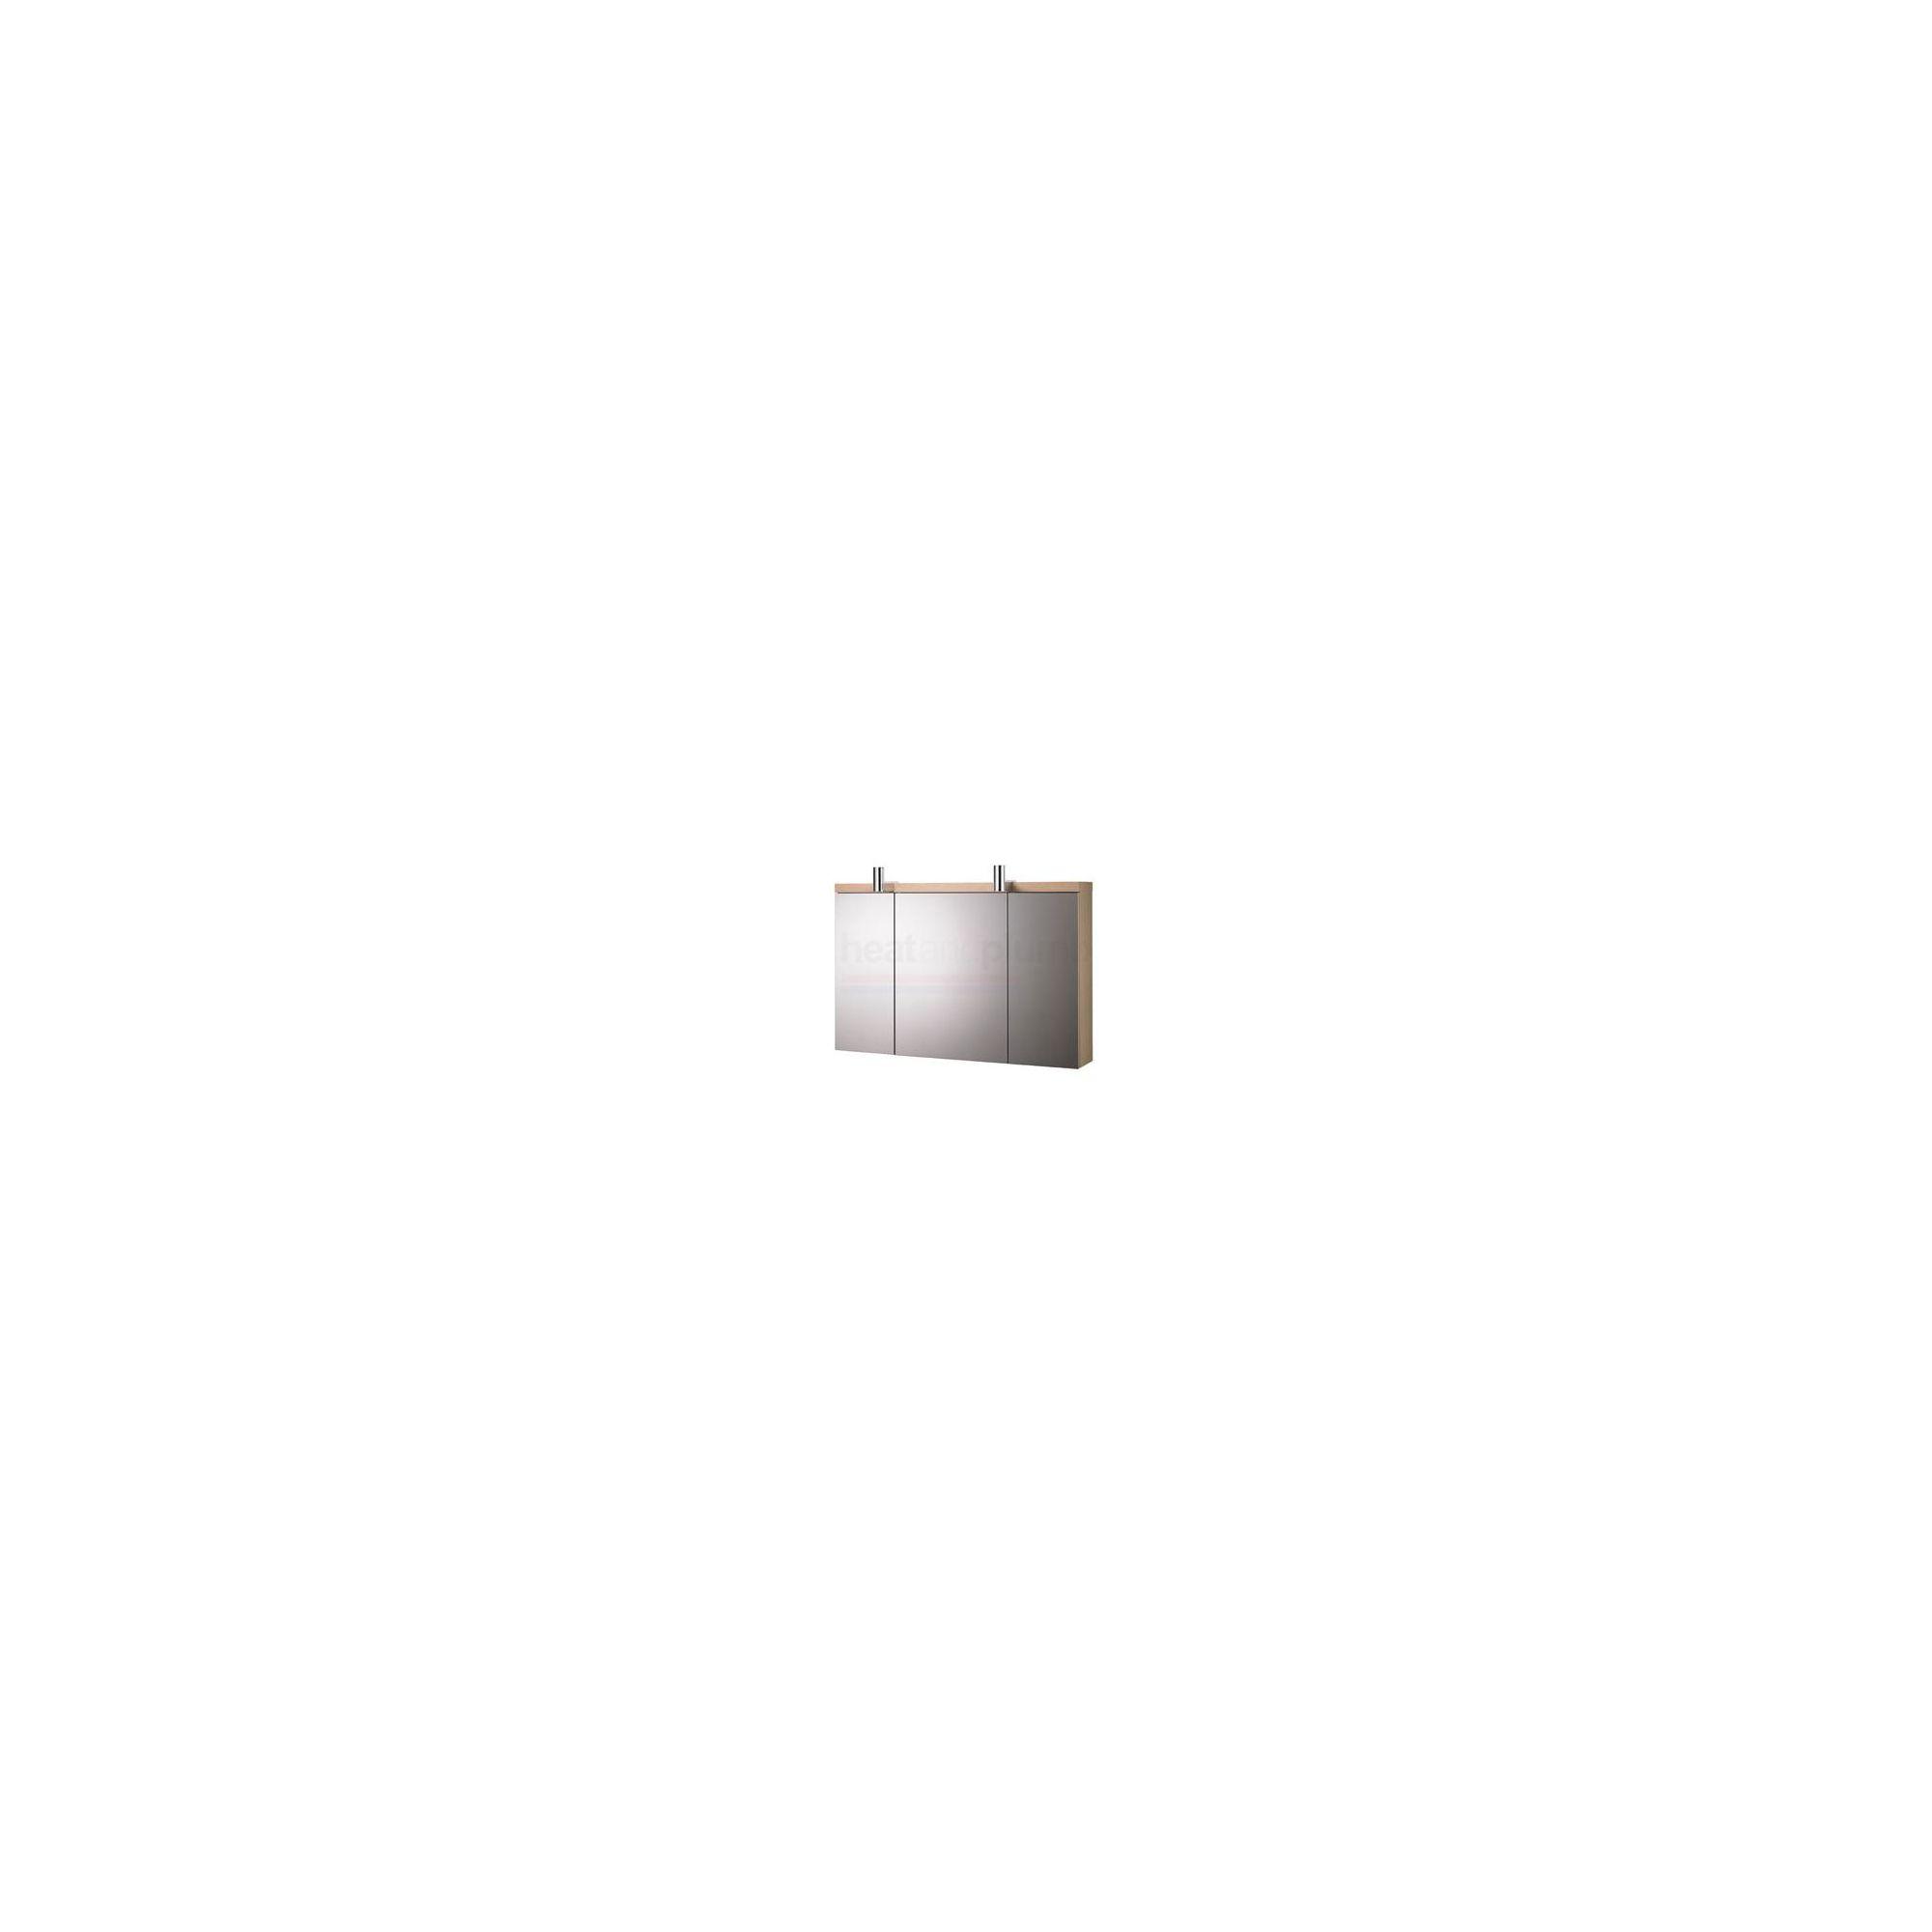 Bedroom Lamps Tesco: 24 Popular Bathroom Lighting Tesco